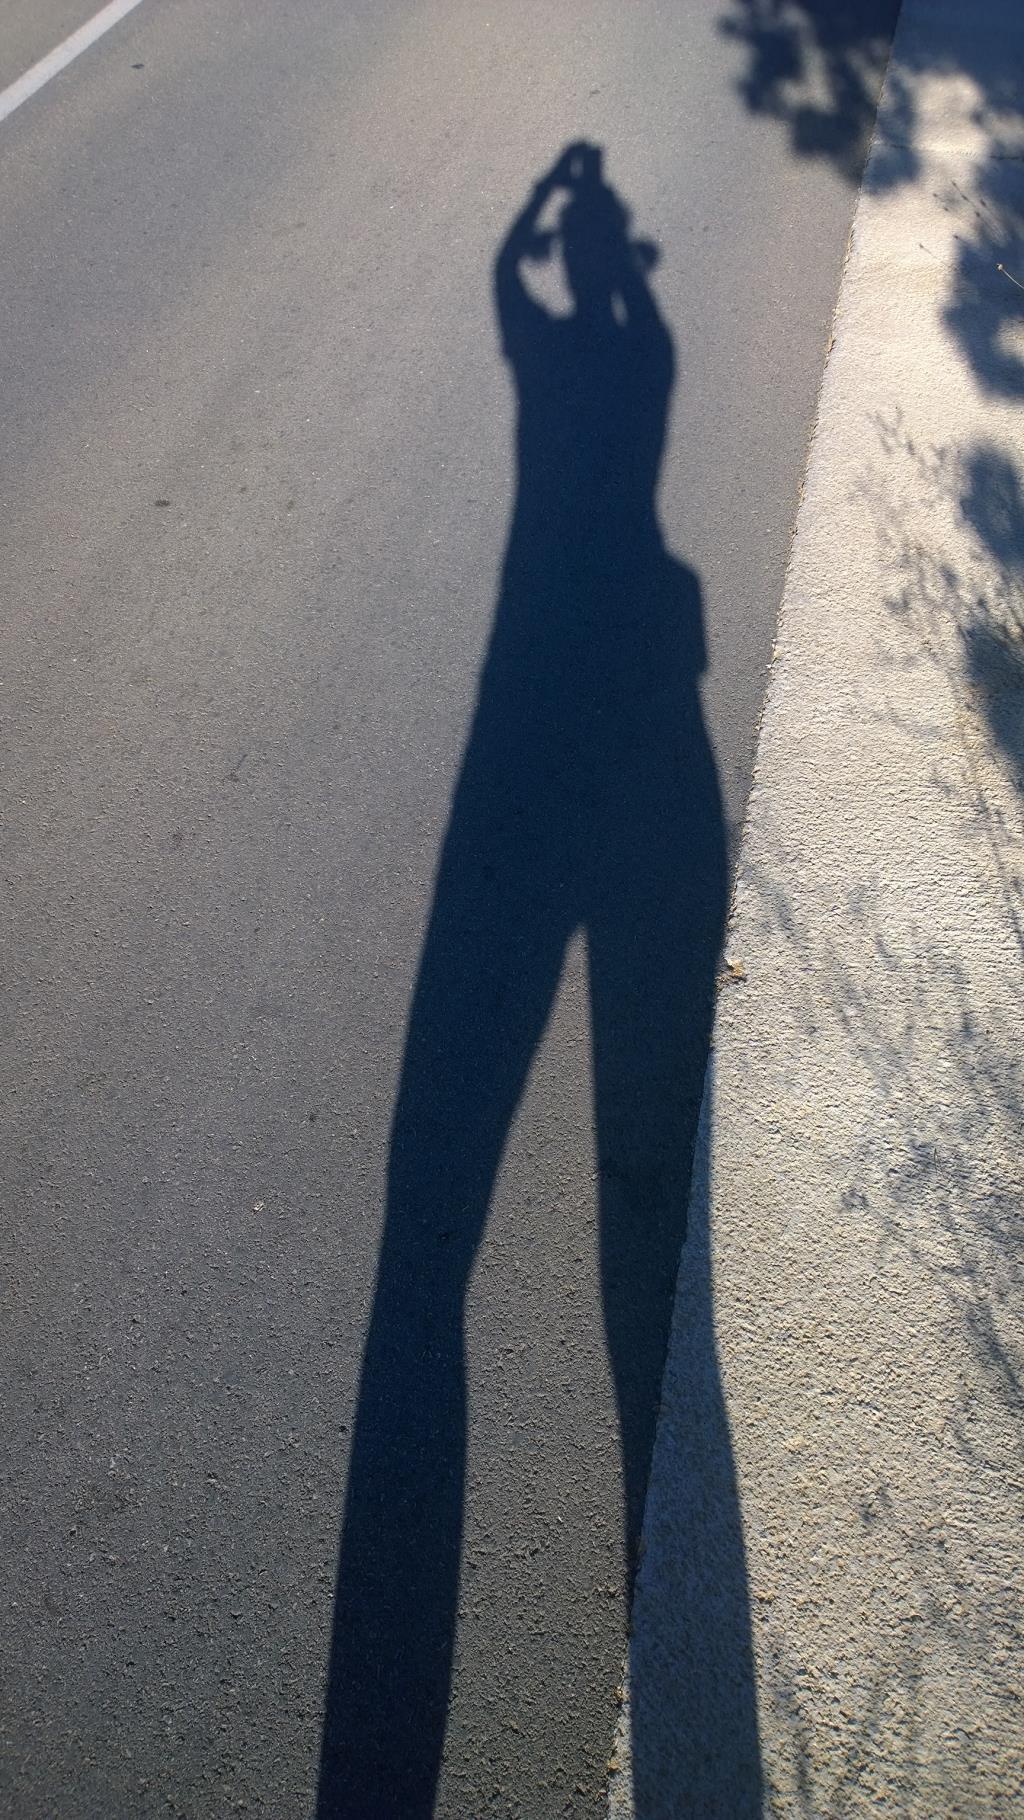 Секс во время утренней пробежки 2 фотография